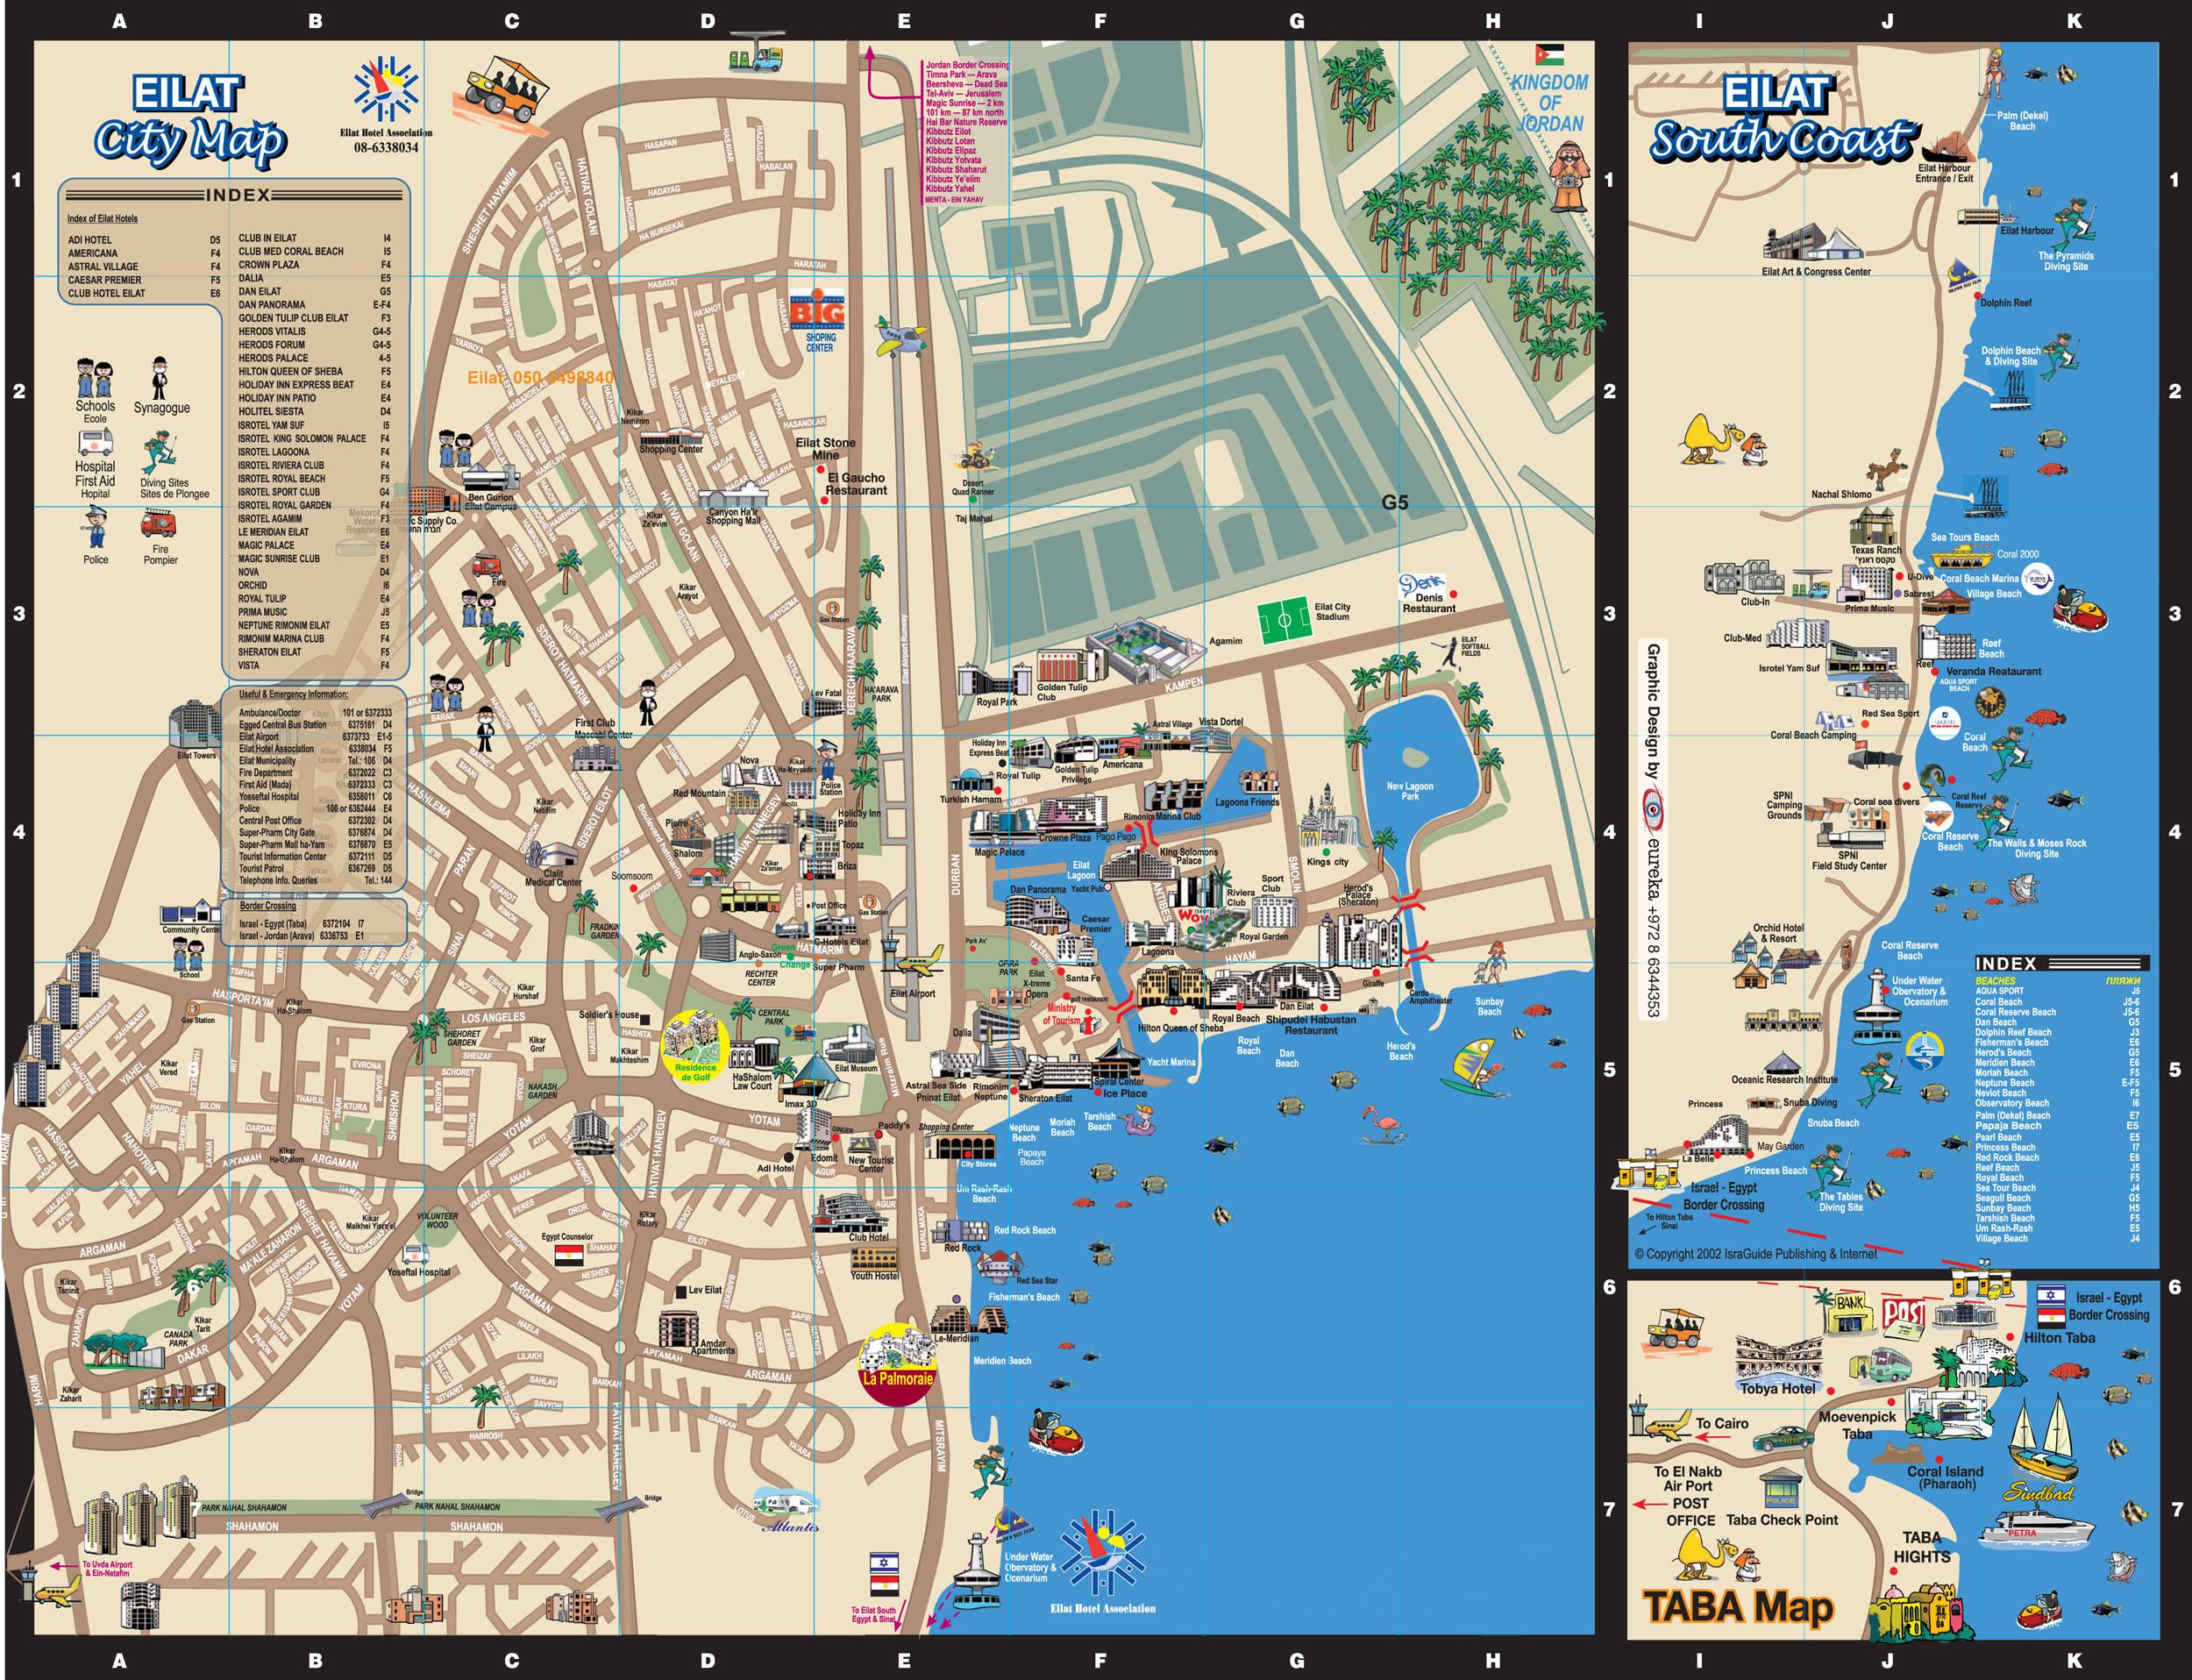 дрозды, отели эйлата на карте города Санкт-Петербурга: